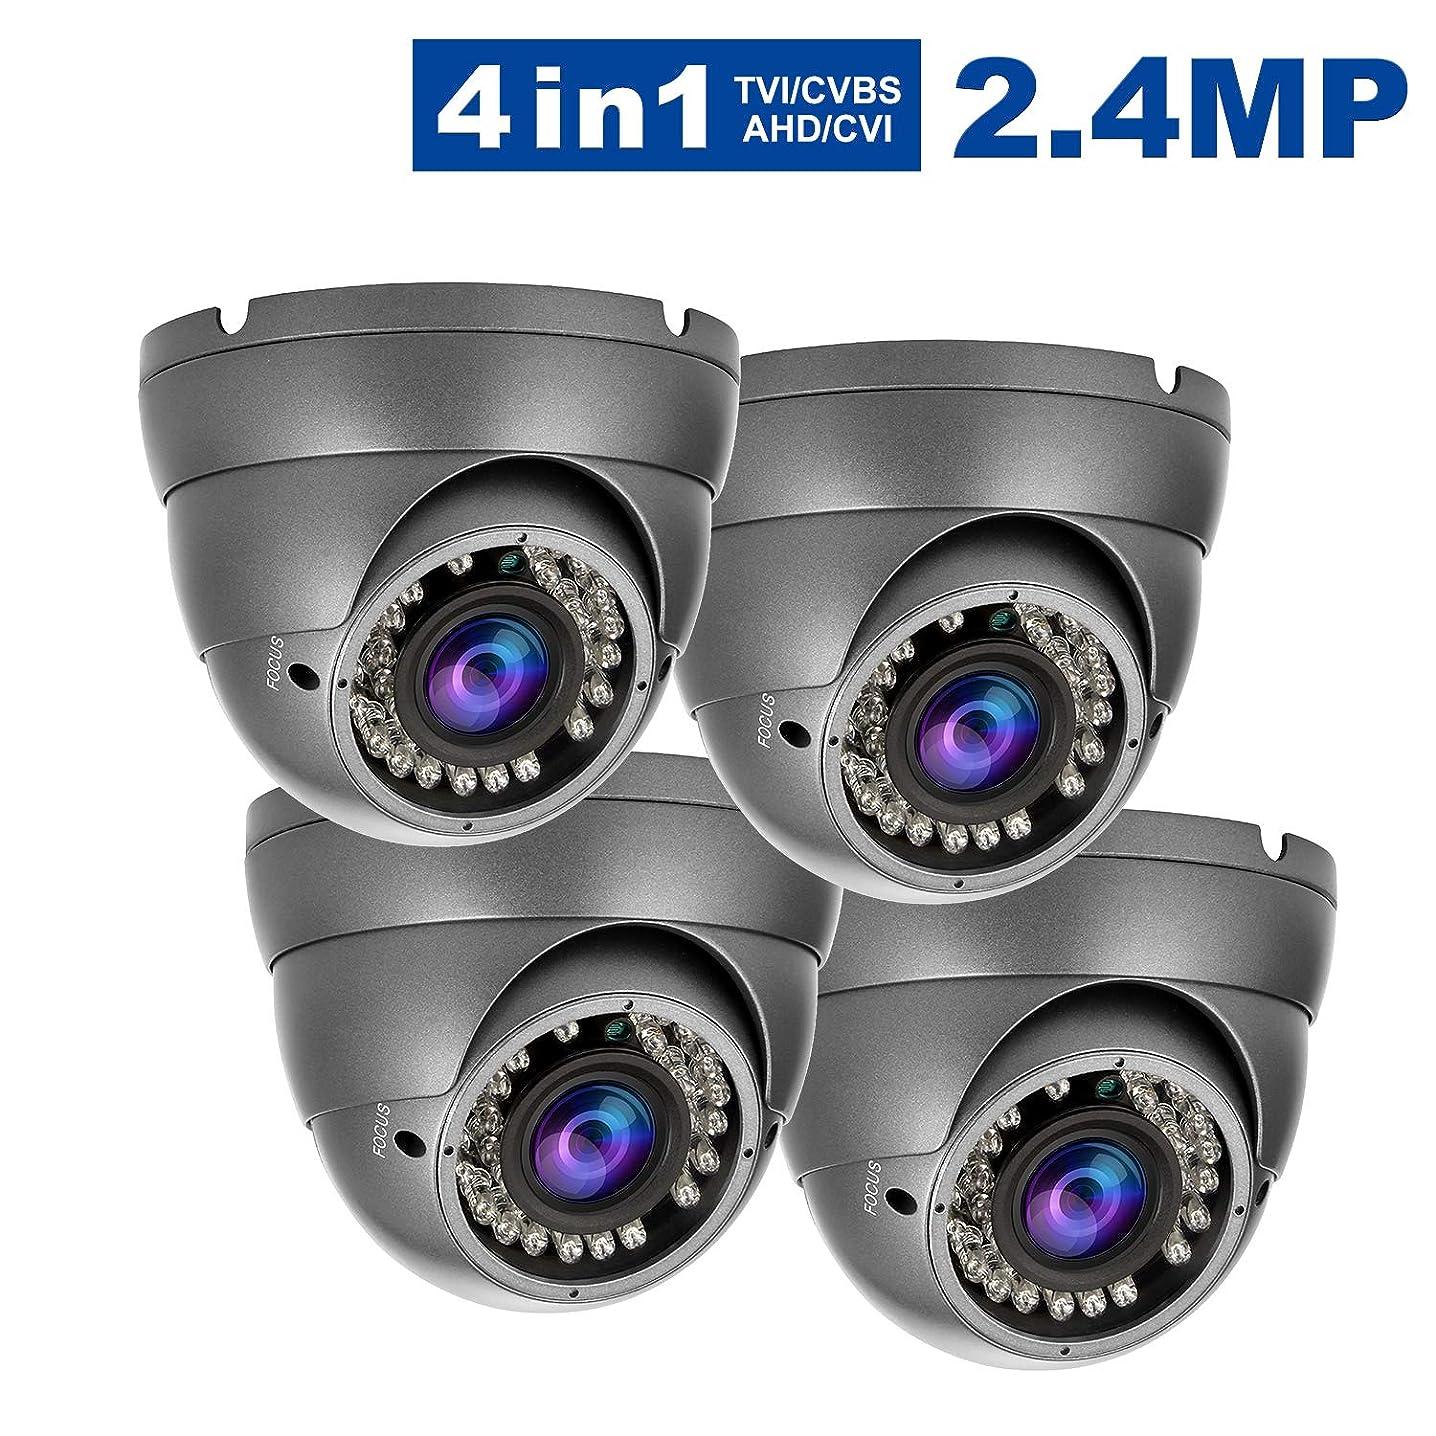 2.4MP Security Dome Camera(4Pack), Anpvees HD 1080P 4-in-1 TVI/CVI/AHD/CVBS Security Cameras, 2.8-12mm Manual Varifocal Lens Waterproof Outdoor Surveillance Camera-Grey